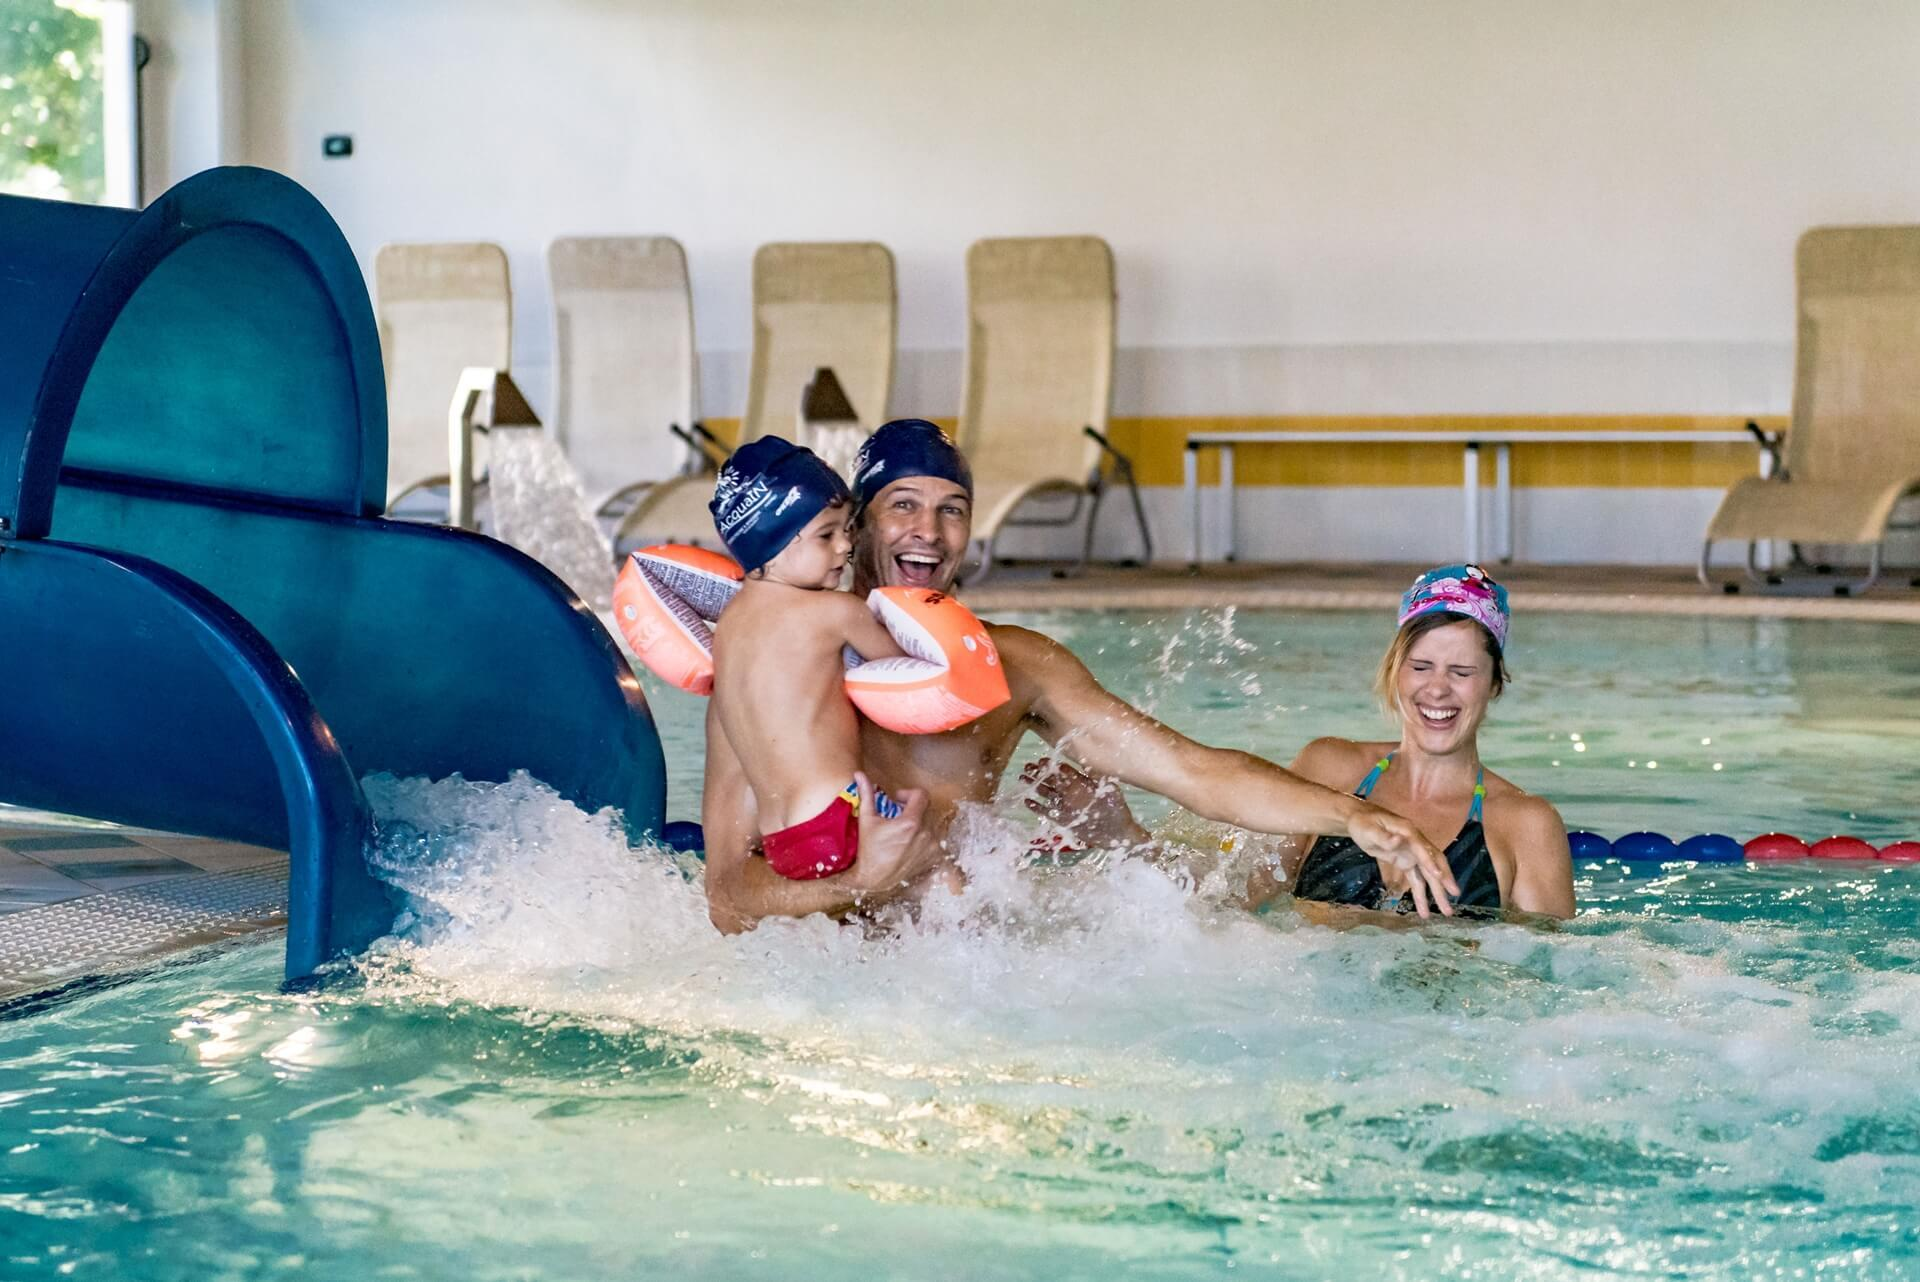 ACQUA-IN swimming pool